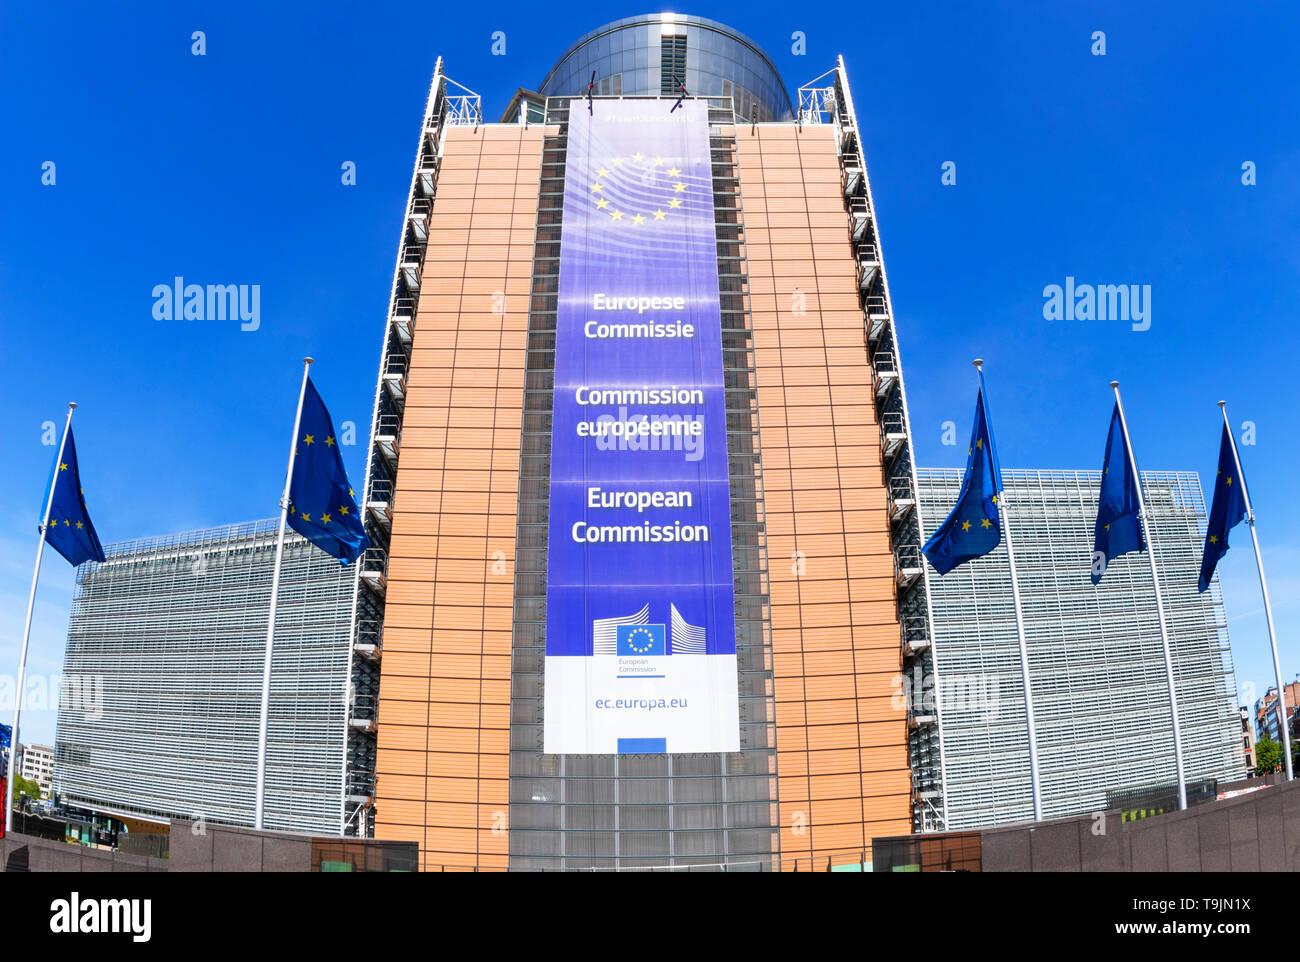 European Commission headquarters building EU commission building european commission building Berlaymont building, Brussels, Belgium, EU, Europe - Stock Image